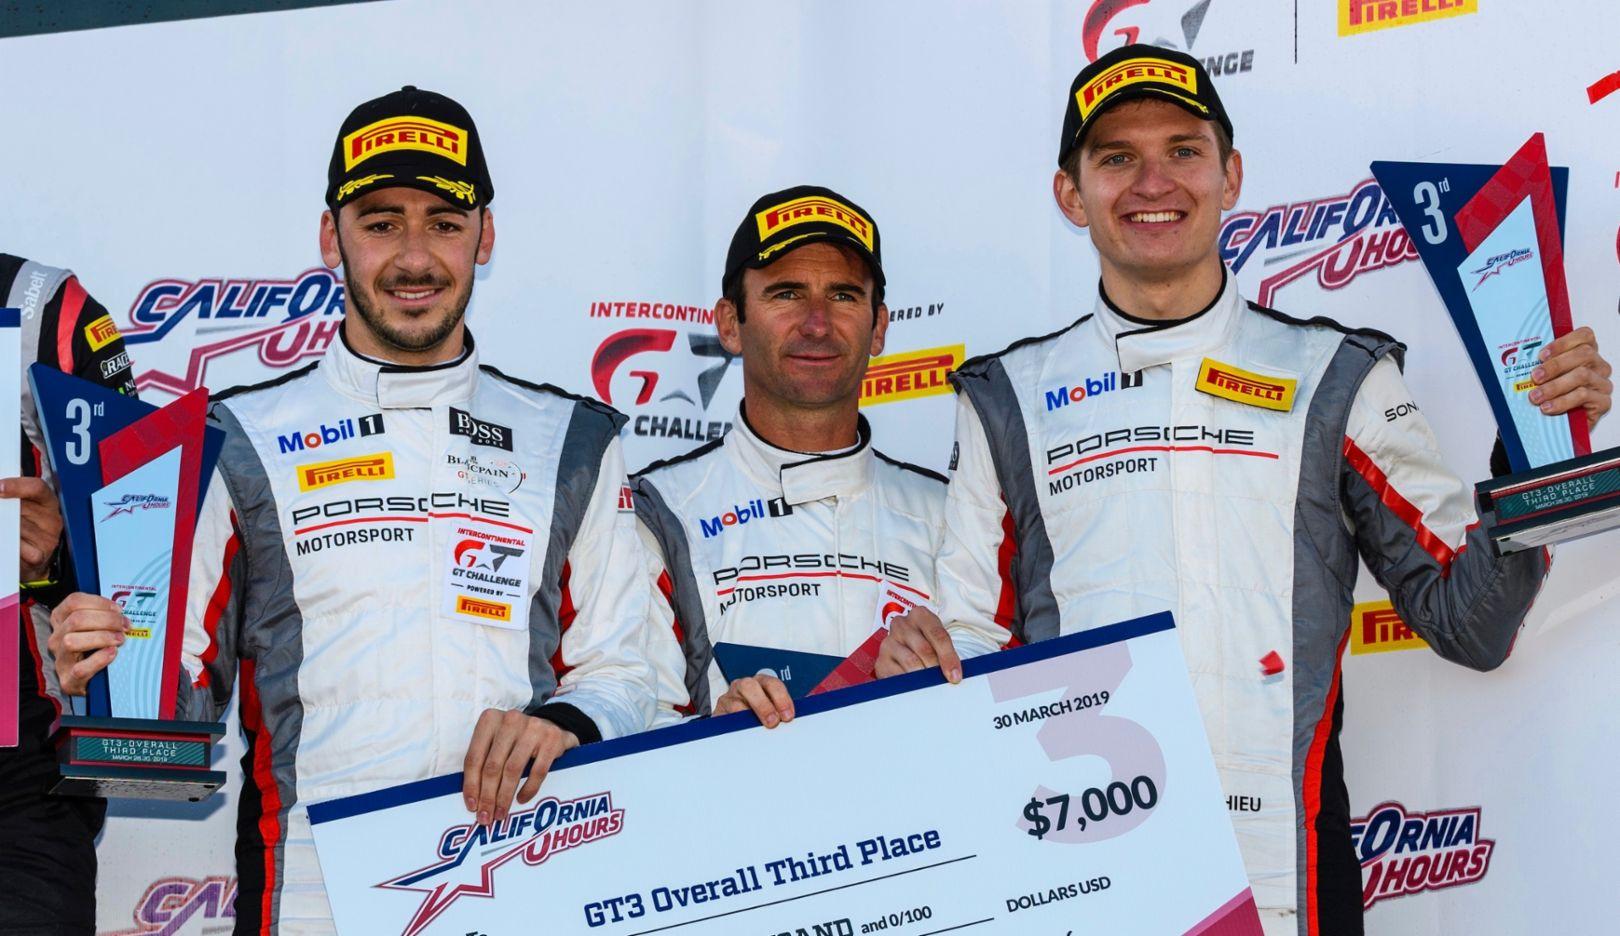 Sven Müller, Romain Dumas, Mathieu Jaminet, l-r, Park Place Motorsports, race, International GT Challenge, Laguna Seca, 2019, Porsche AG